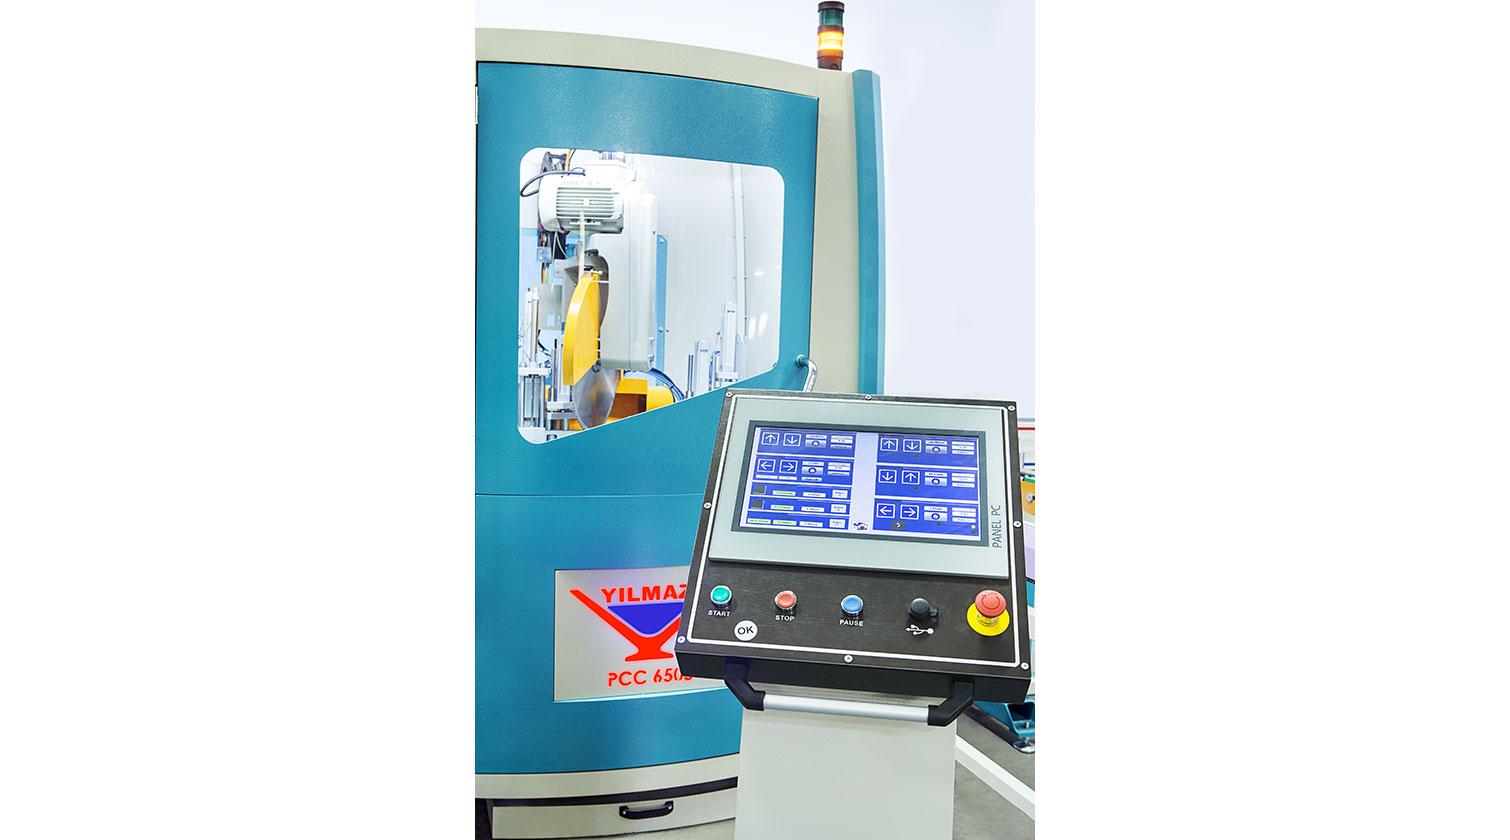 INT pvc cutting centre Yilmaz PCC 6505 Operator interface